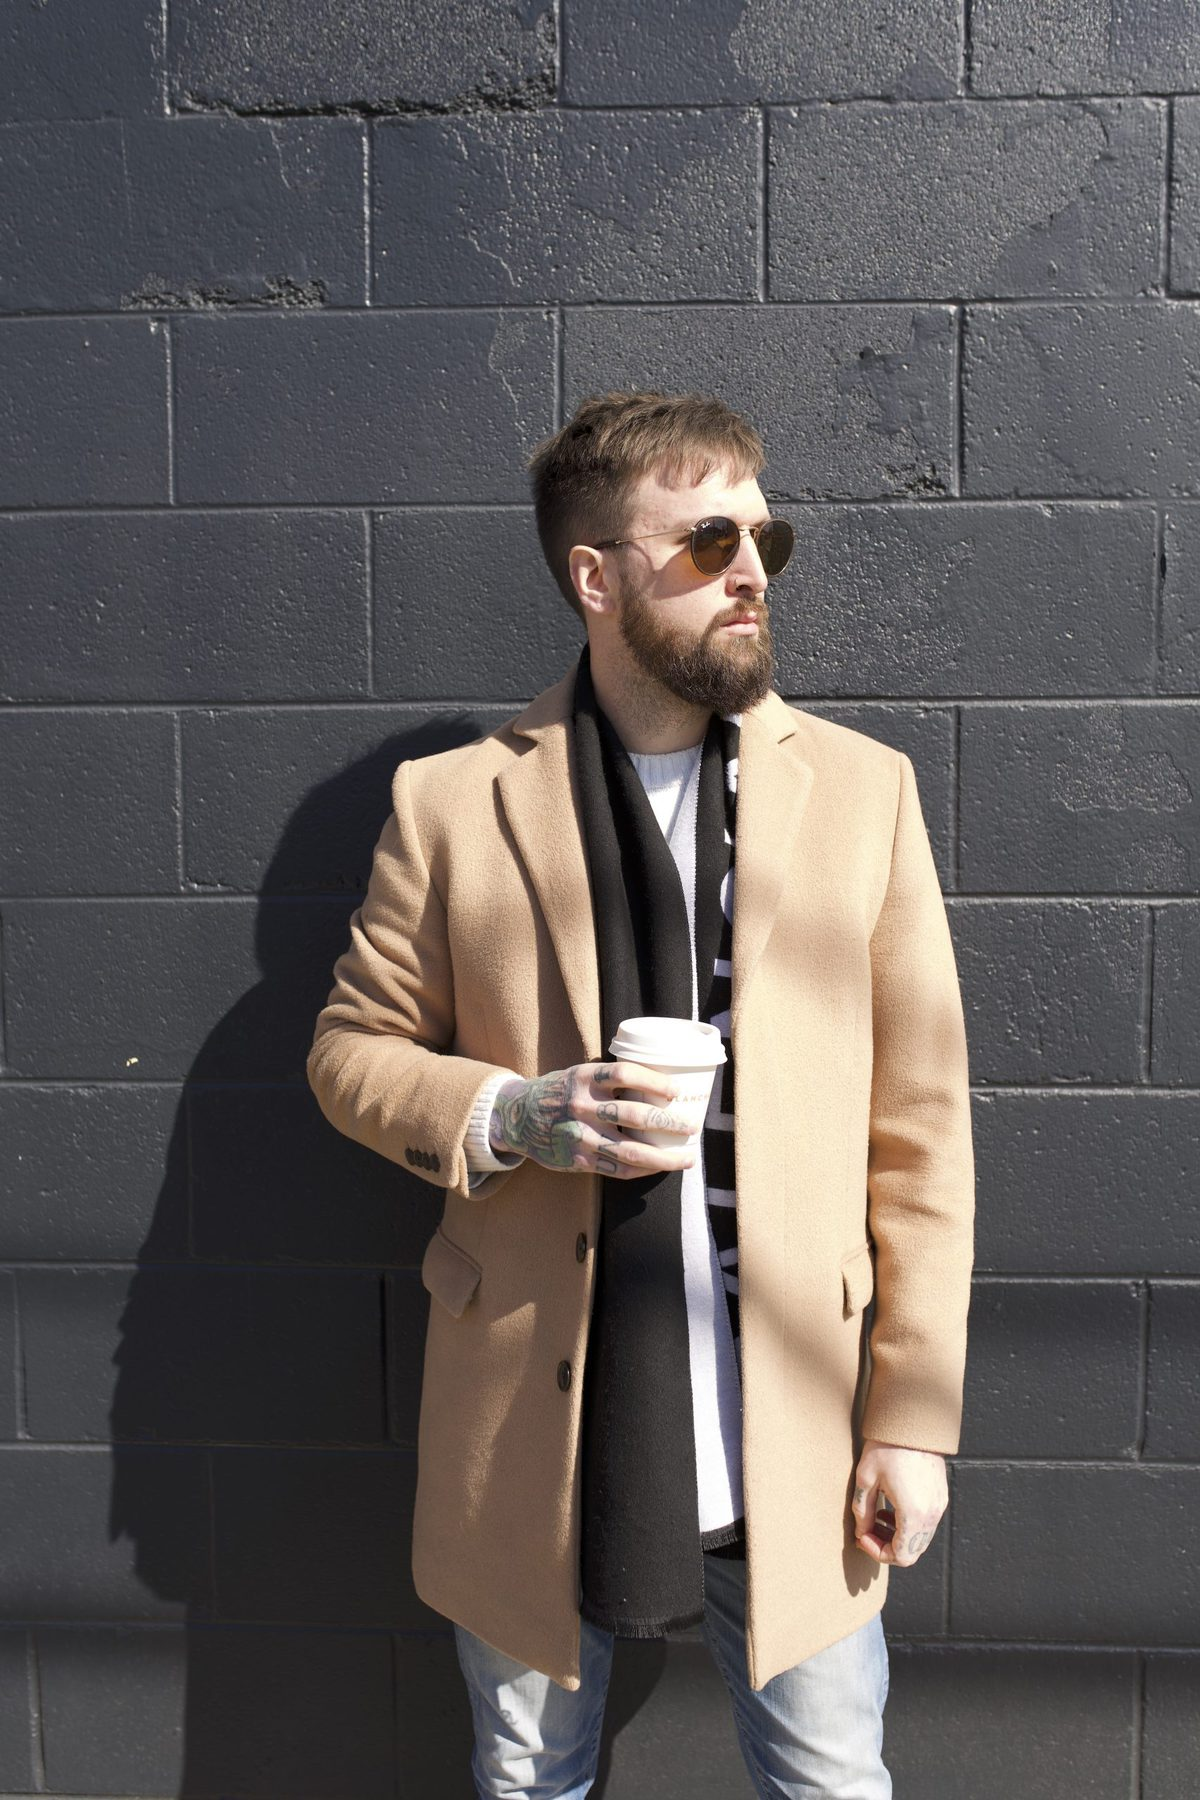 Myke Metzger w/ coffee in hand at Blacnchard's Coffee in Richmond, VA